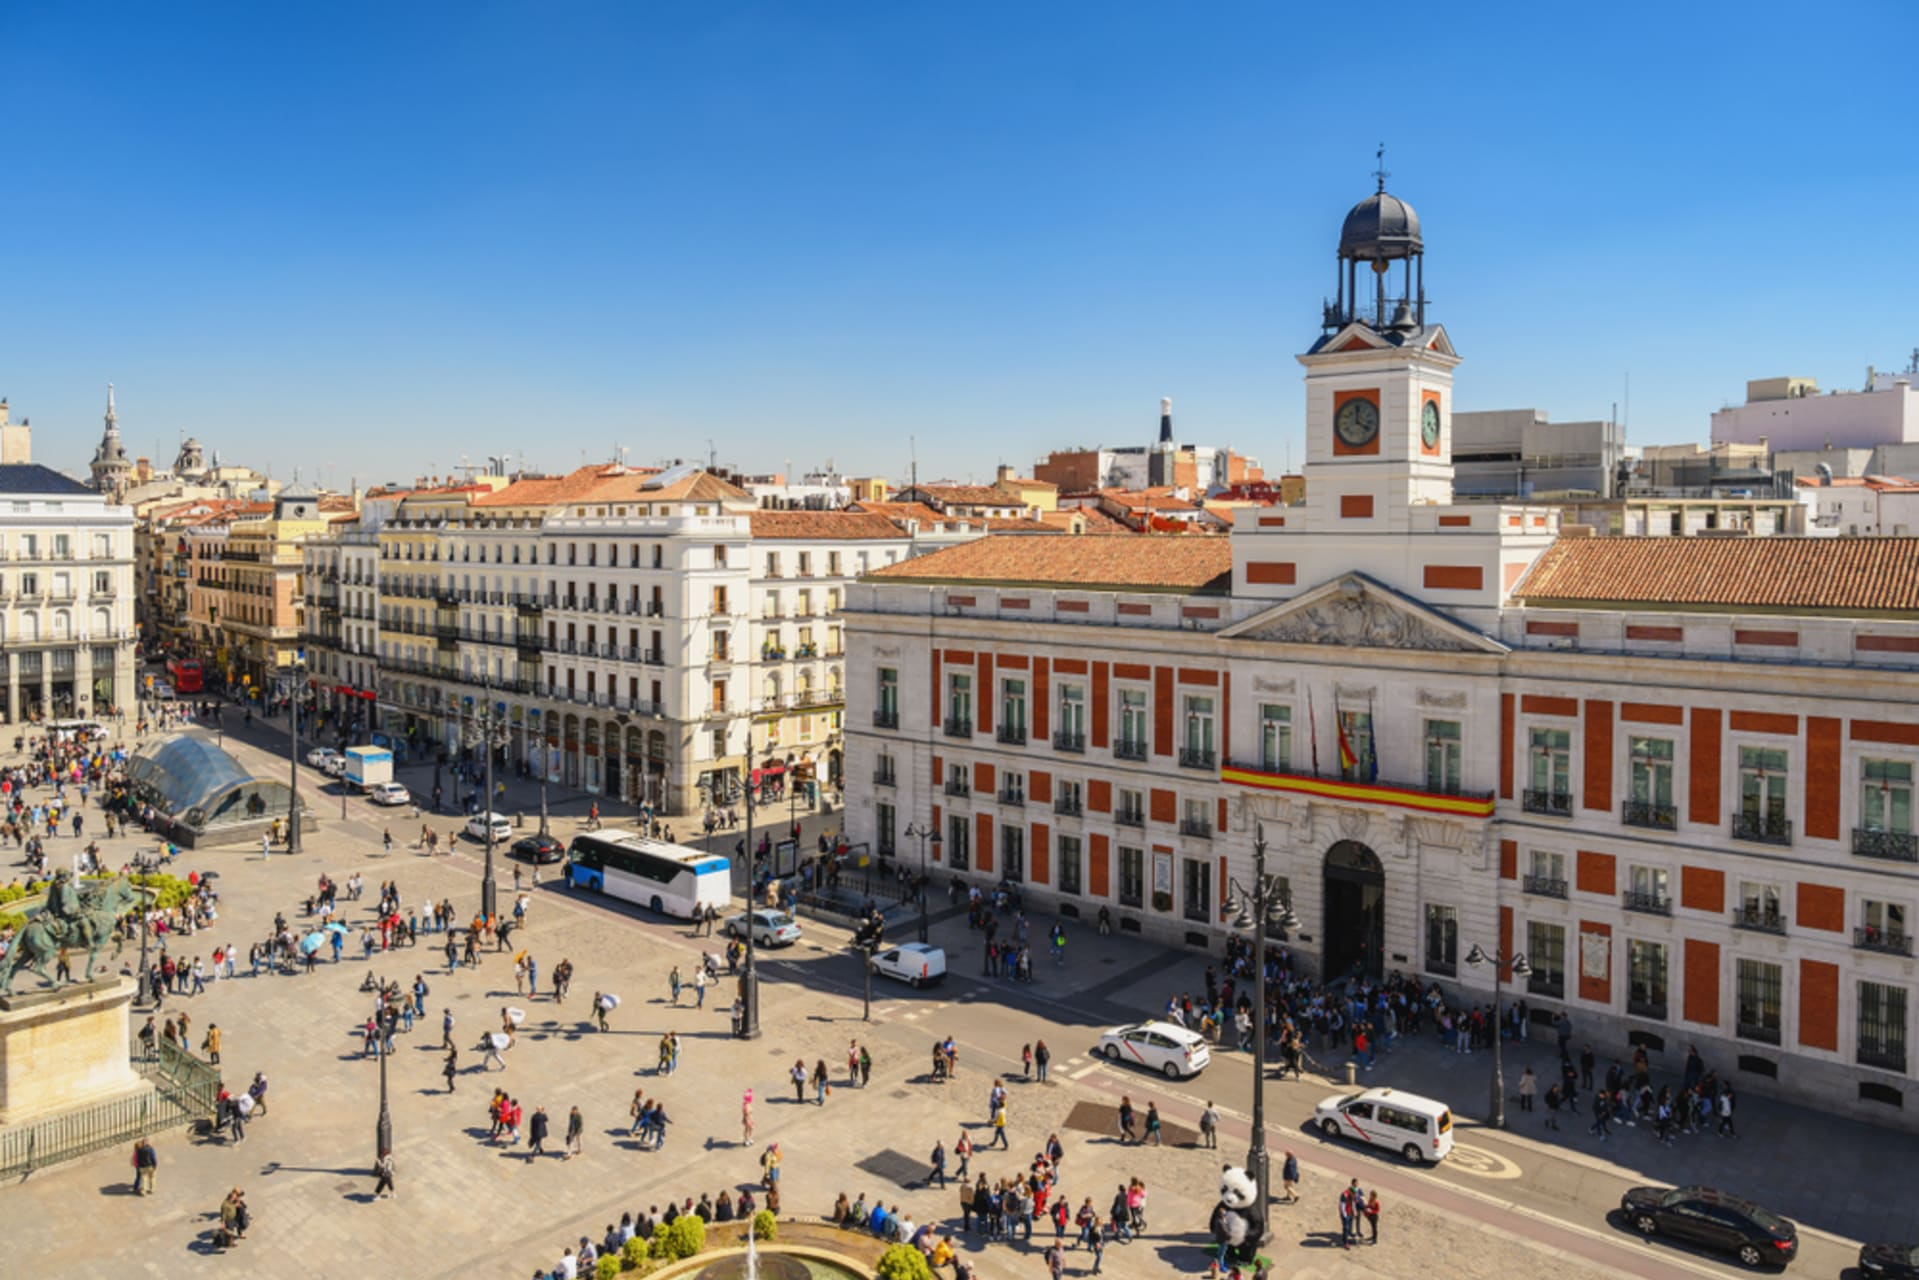 Madrid - The Heart of Madrid